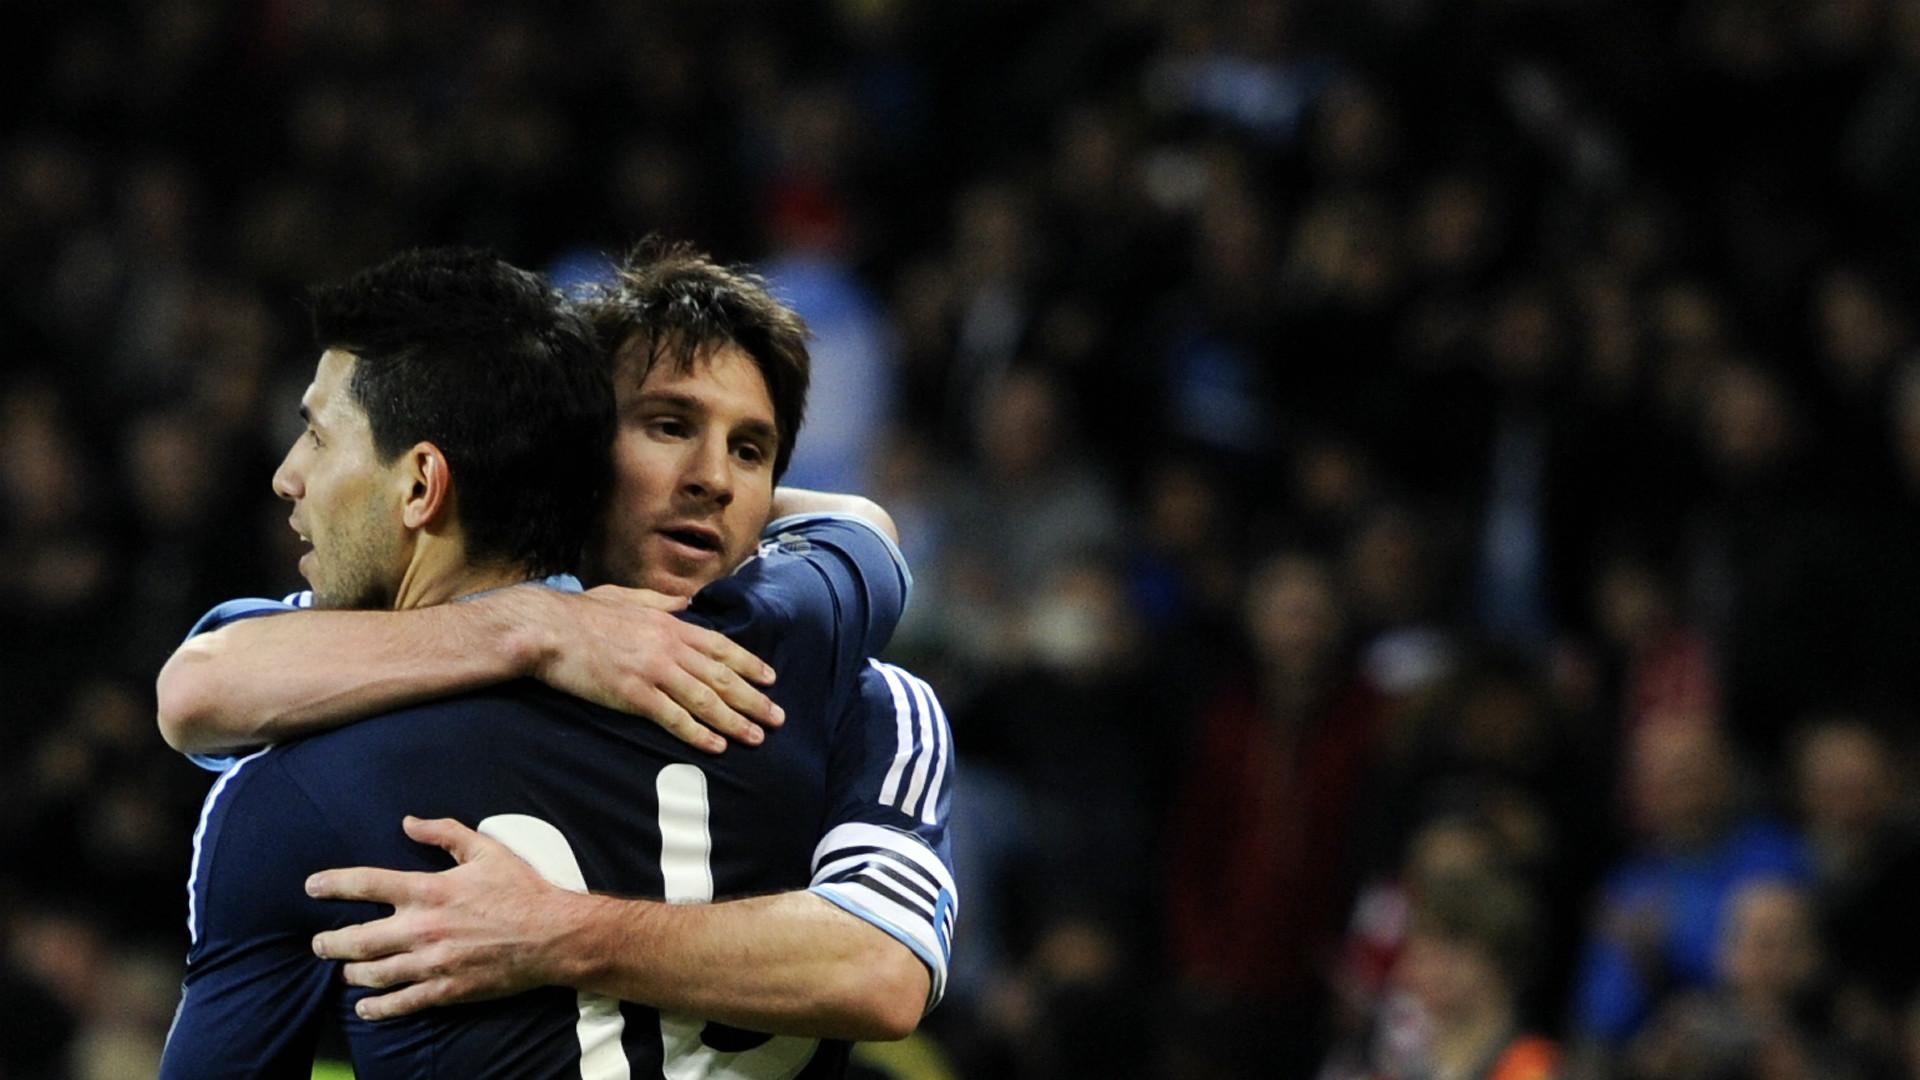 Messi Agüero Argentina Suiza Amistoso 2012